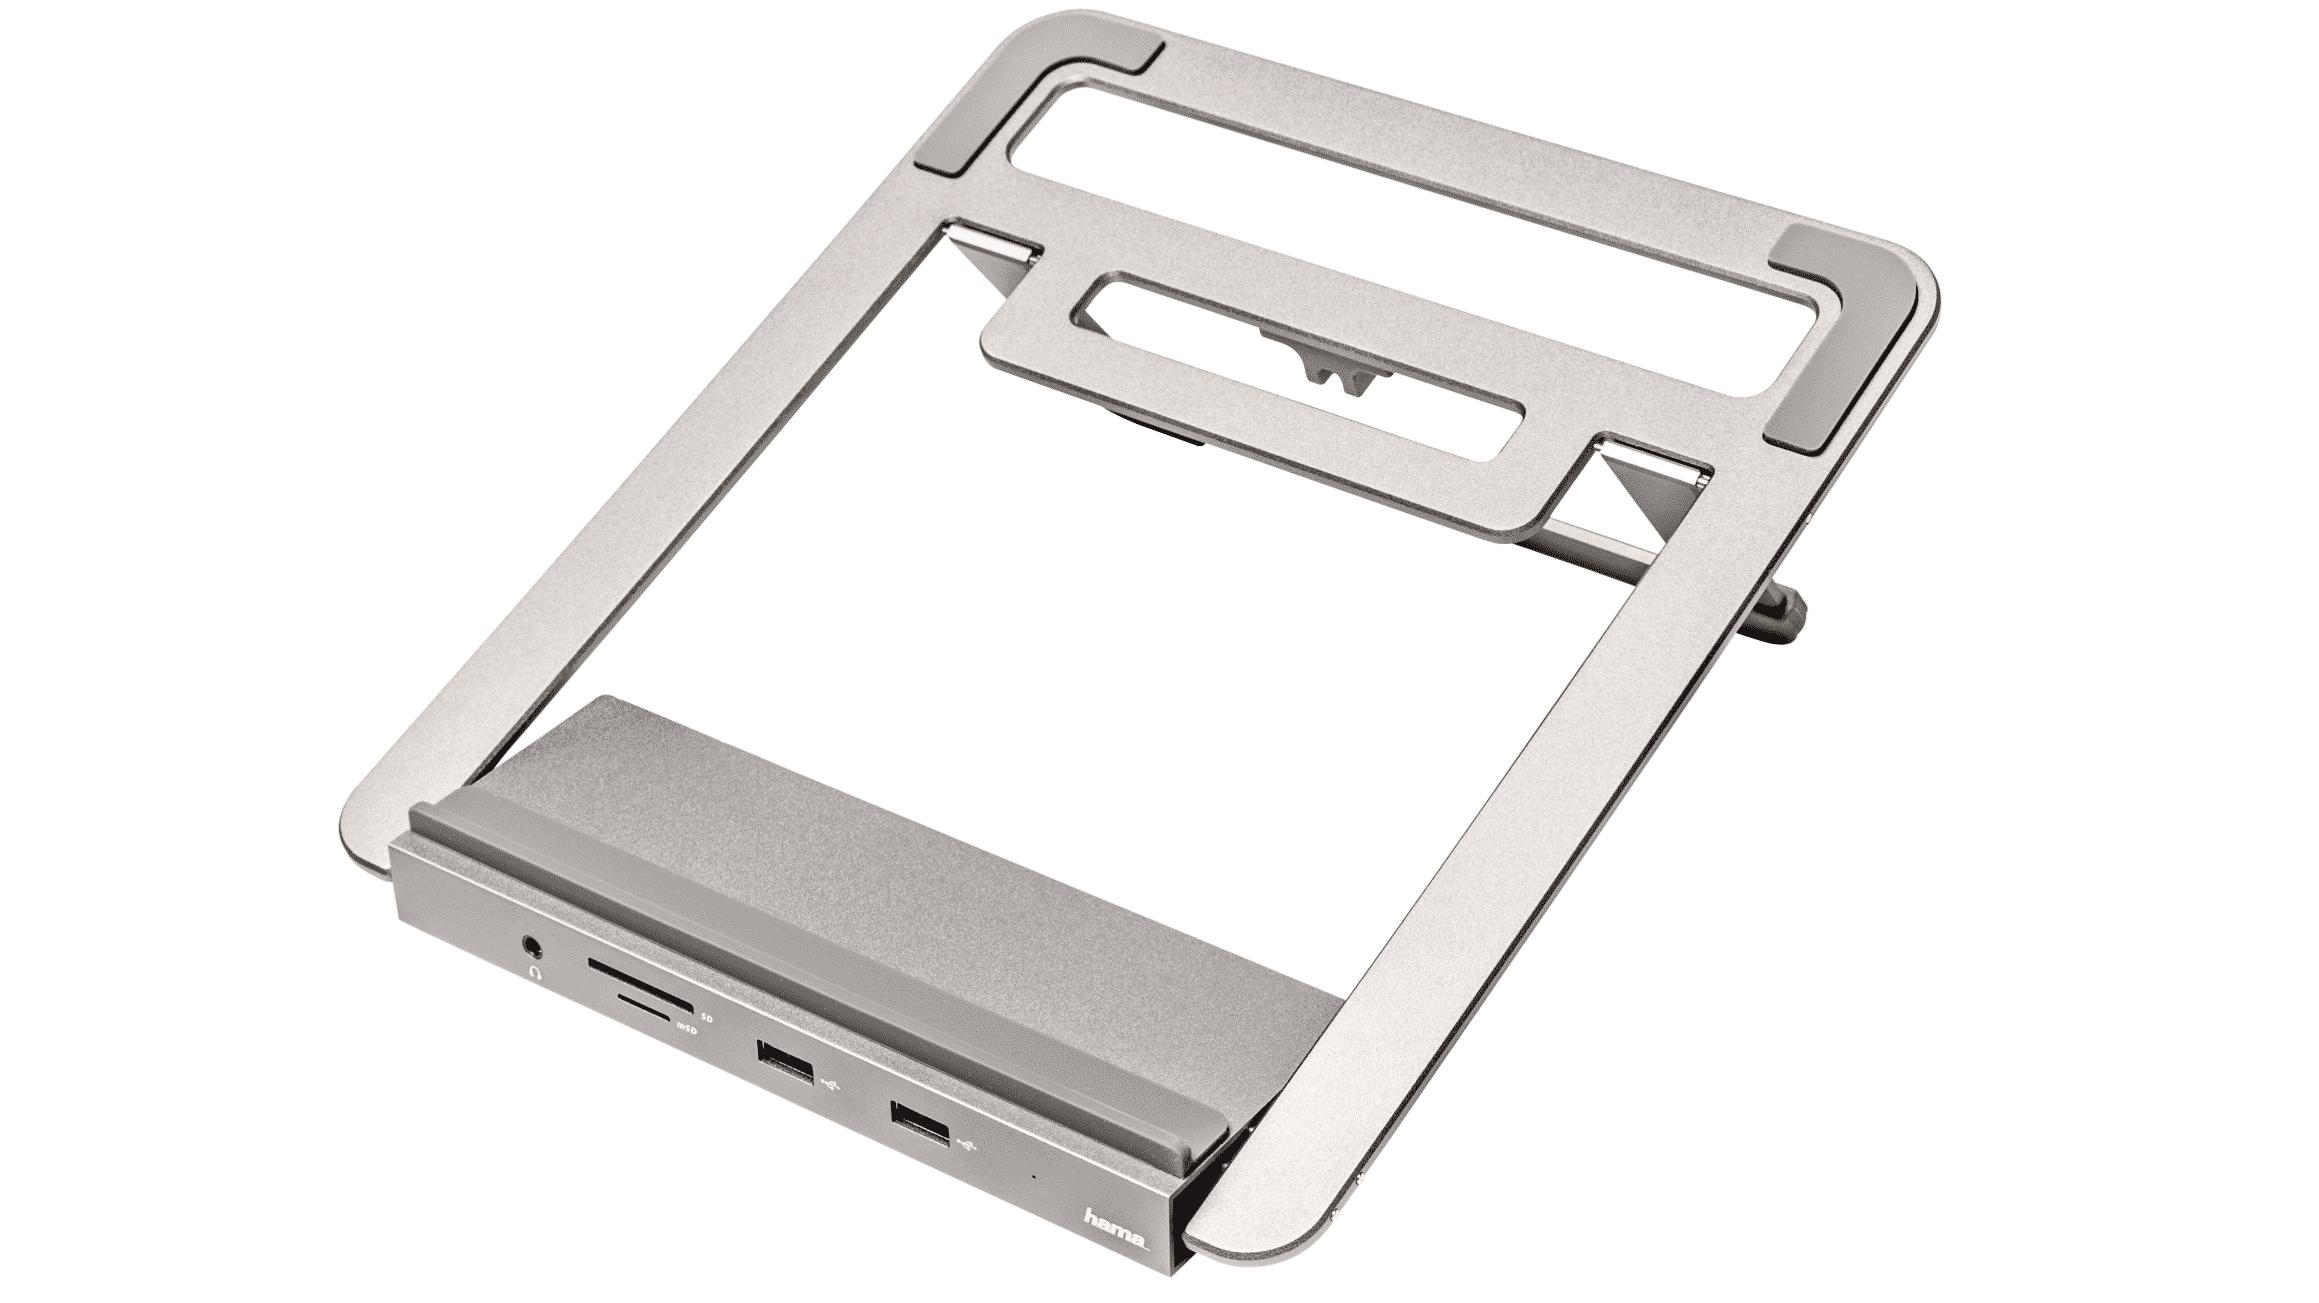 Hama USB-C-Docking-Station mit Notebook-Stand